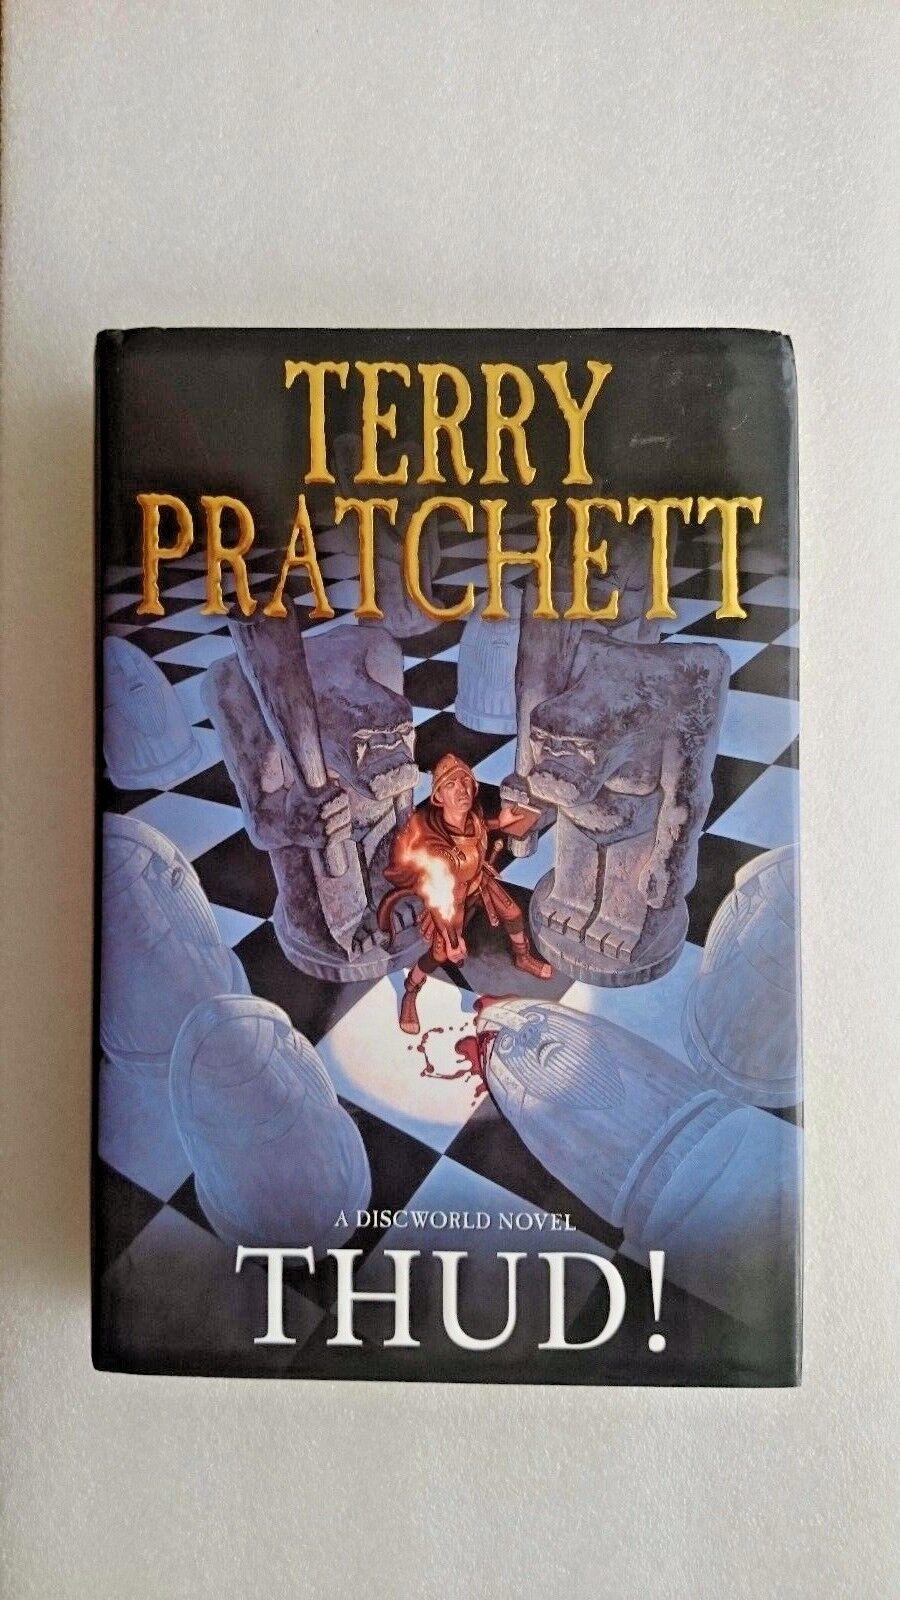 Terry Pratchett Thud A Discworld Novel Large Hardback Book (Signed)